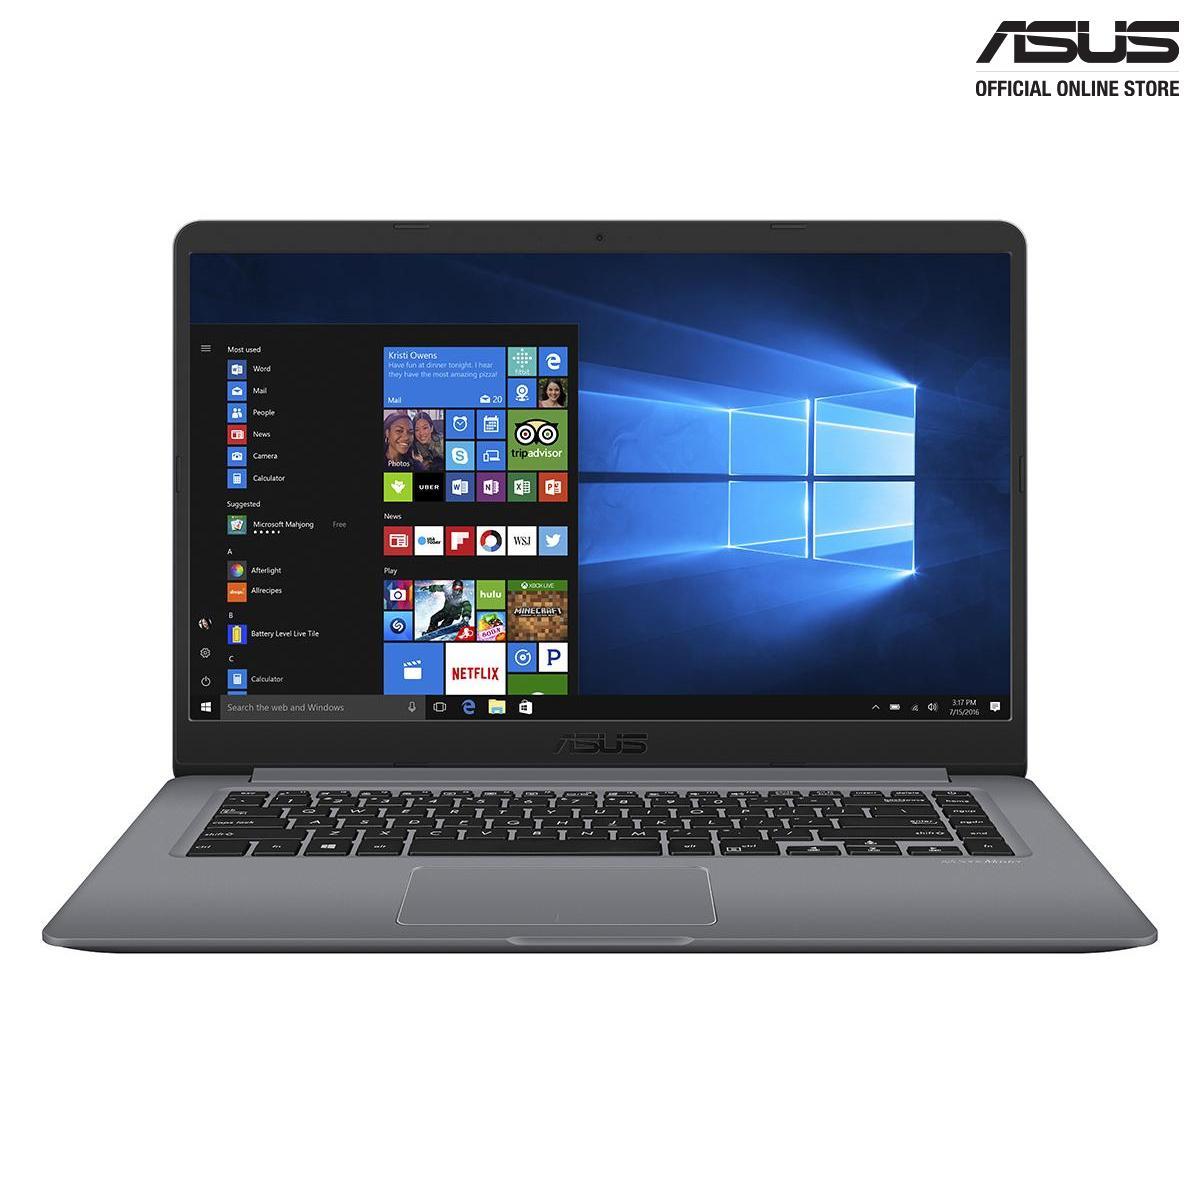 ASUS Vivobook X510UF-EJ370T (Star Grey)